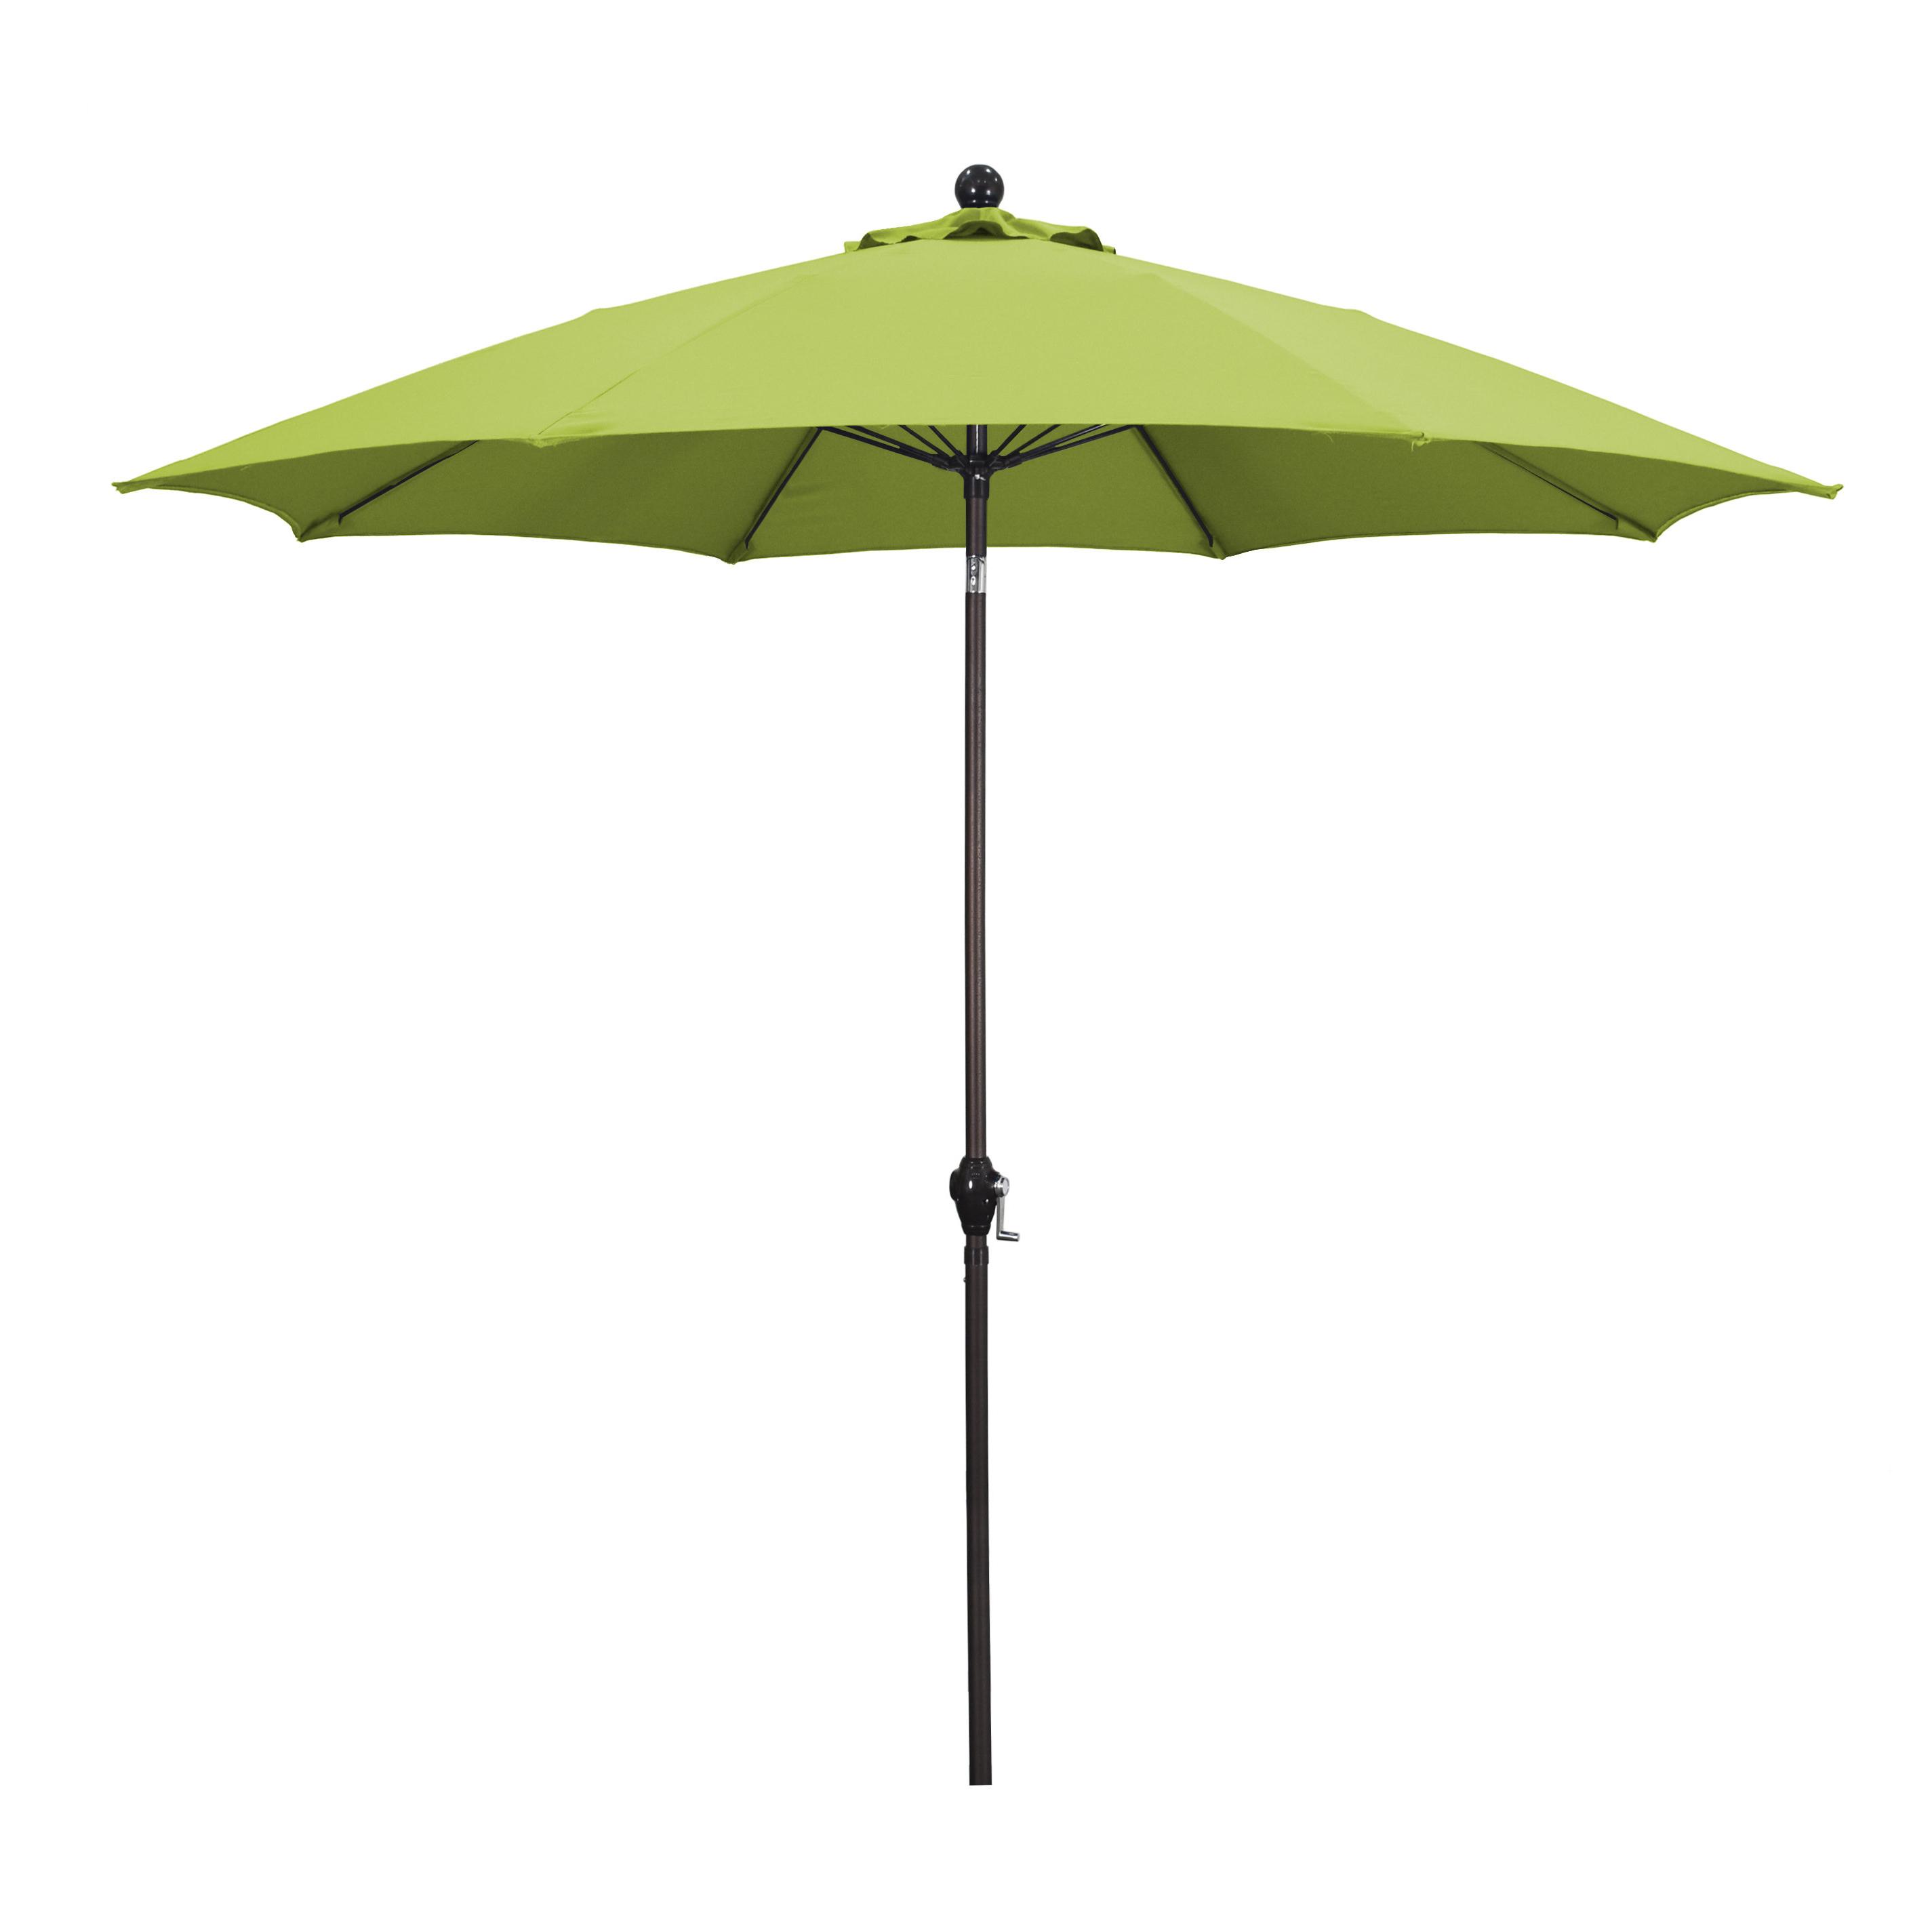 Annika Market Umbrellas Intended For Recent 9' Market Umbrella (View 6 of 20)